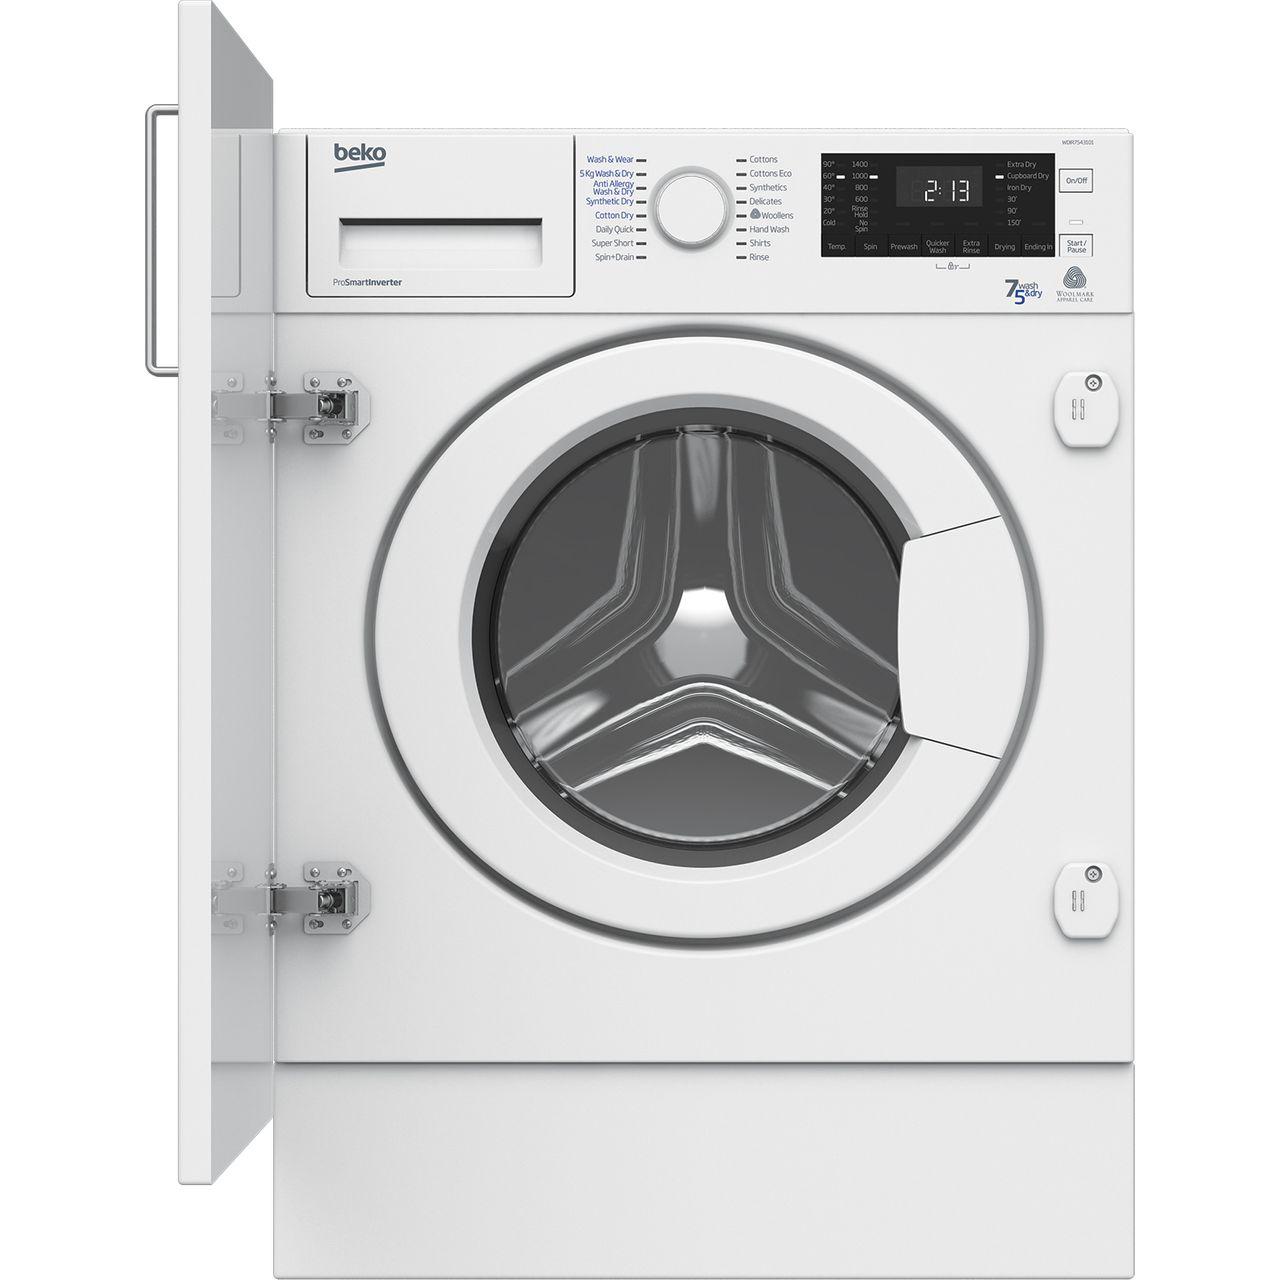 Beko WDIR7543101 Integrated Washer Dryer in White